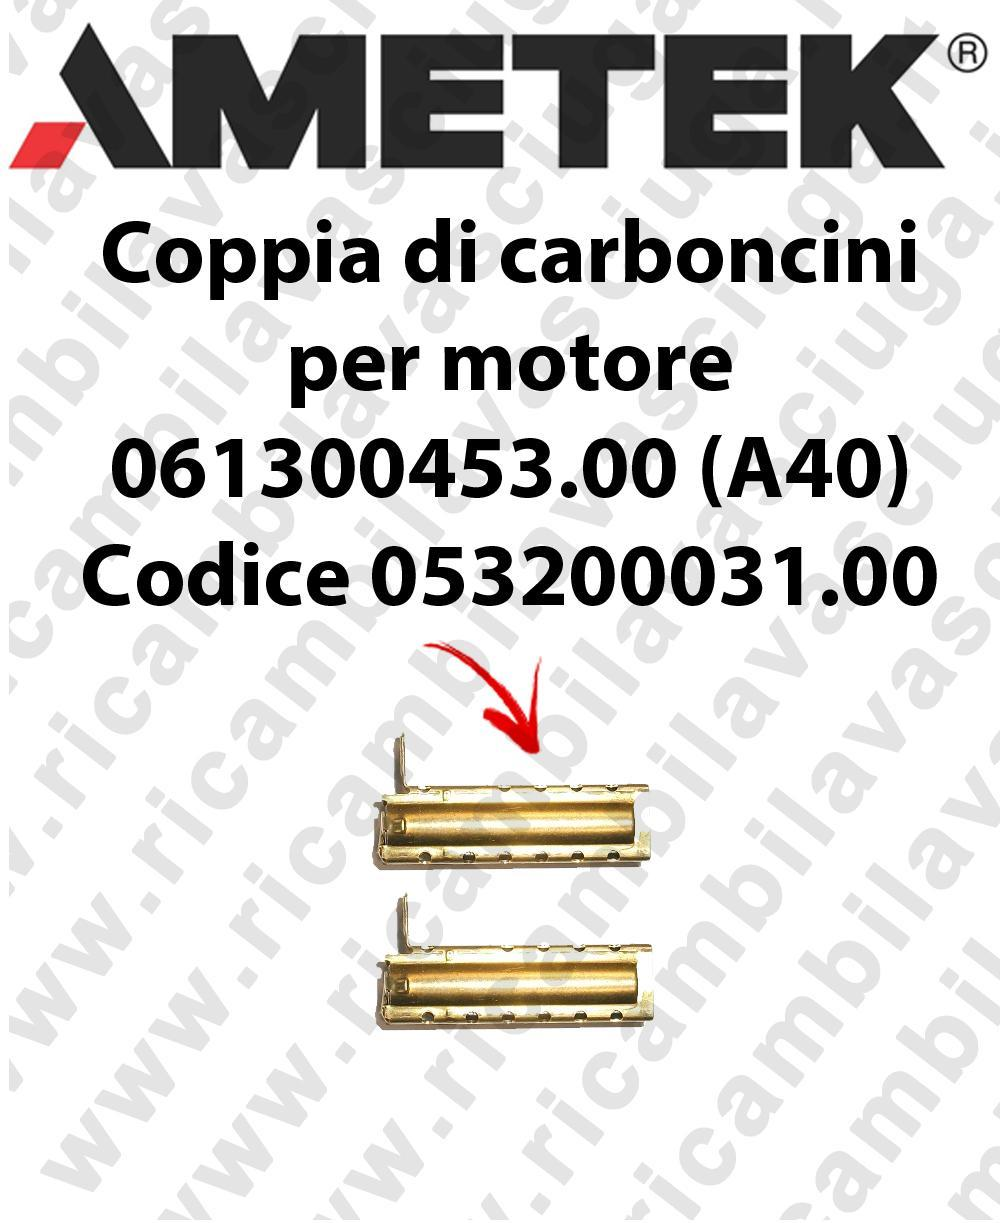 COPPIA di Carboncini motor de aspiración para motore Ametek 061300453.00 (A40) Cod: 053200031.00